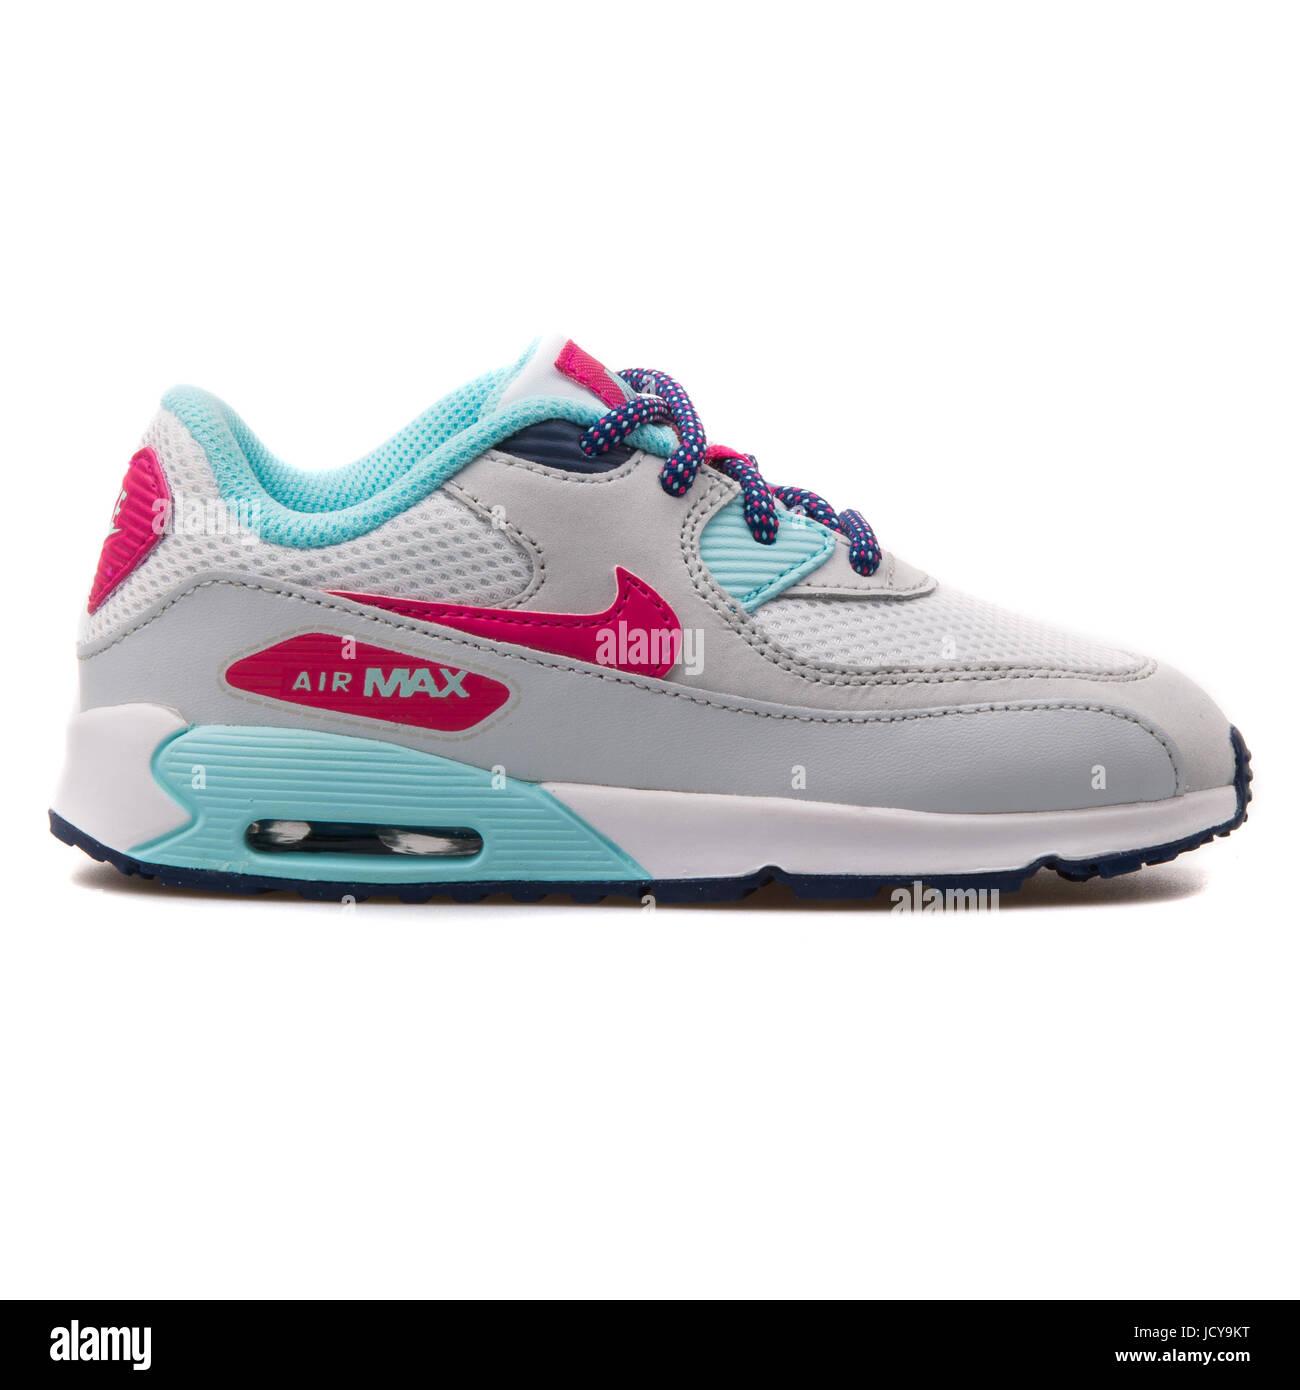 Nike Air Max 90 mesh (TD) bianco, grigio, rosa e turchese bimbo a ...